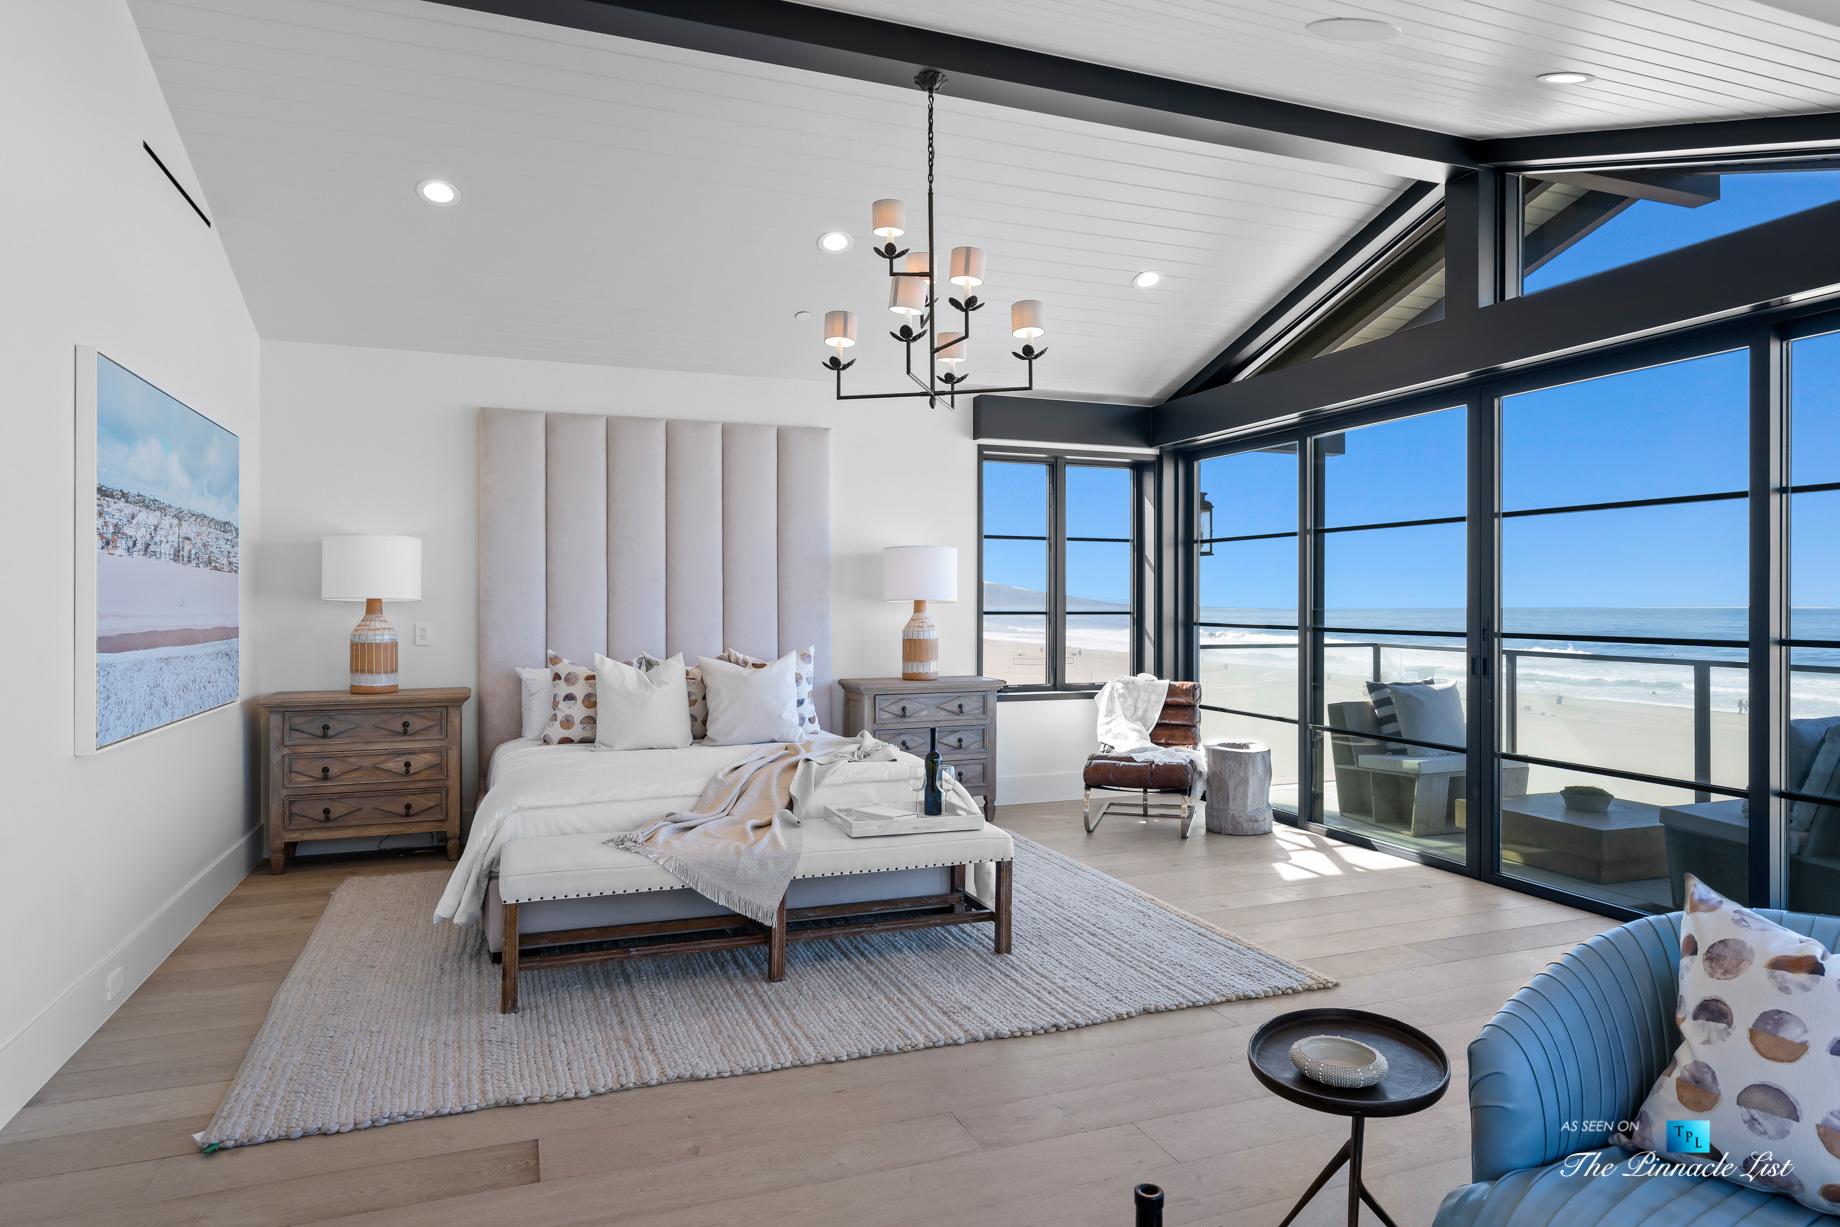 508 The Strand, Manhattan Beach, CA, USA – Master Bedroom Windows Beach View – Luxury Real Estate – Oceanfront Home